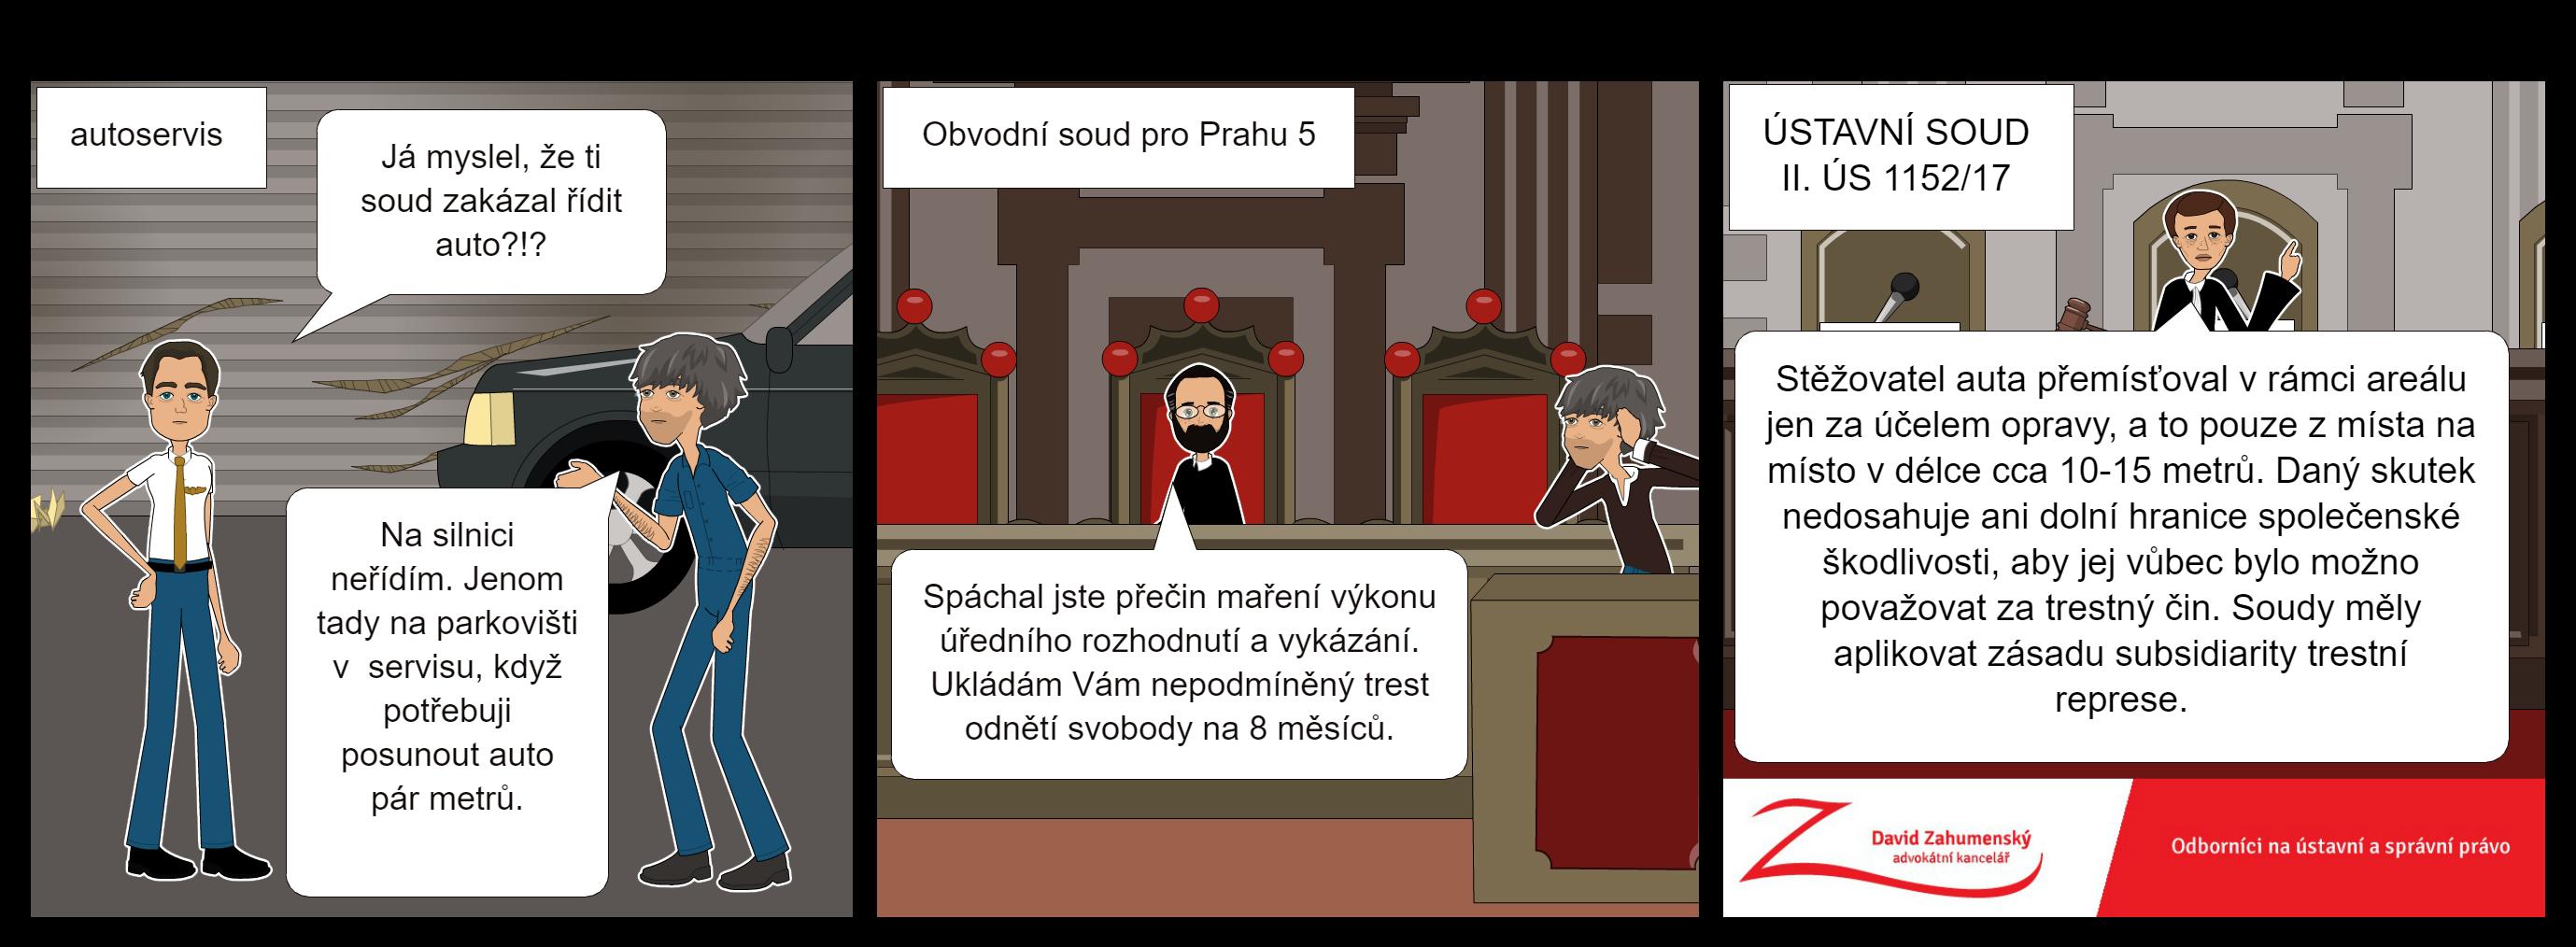 subsidiarita trestní represe